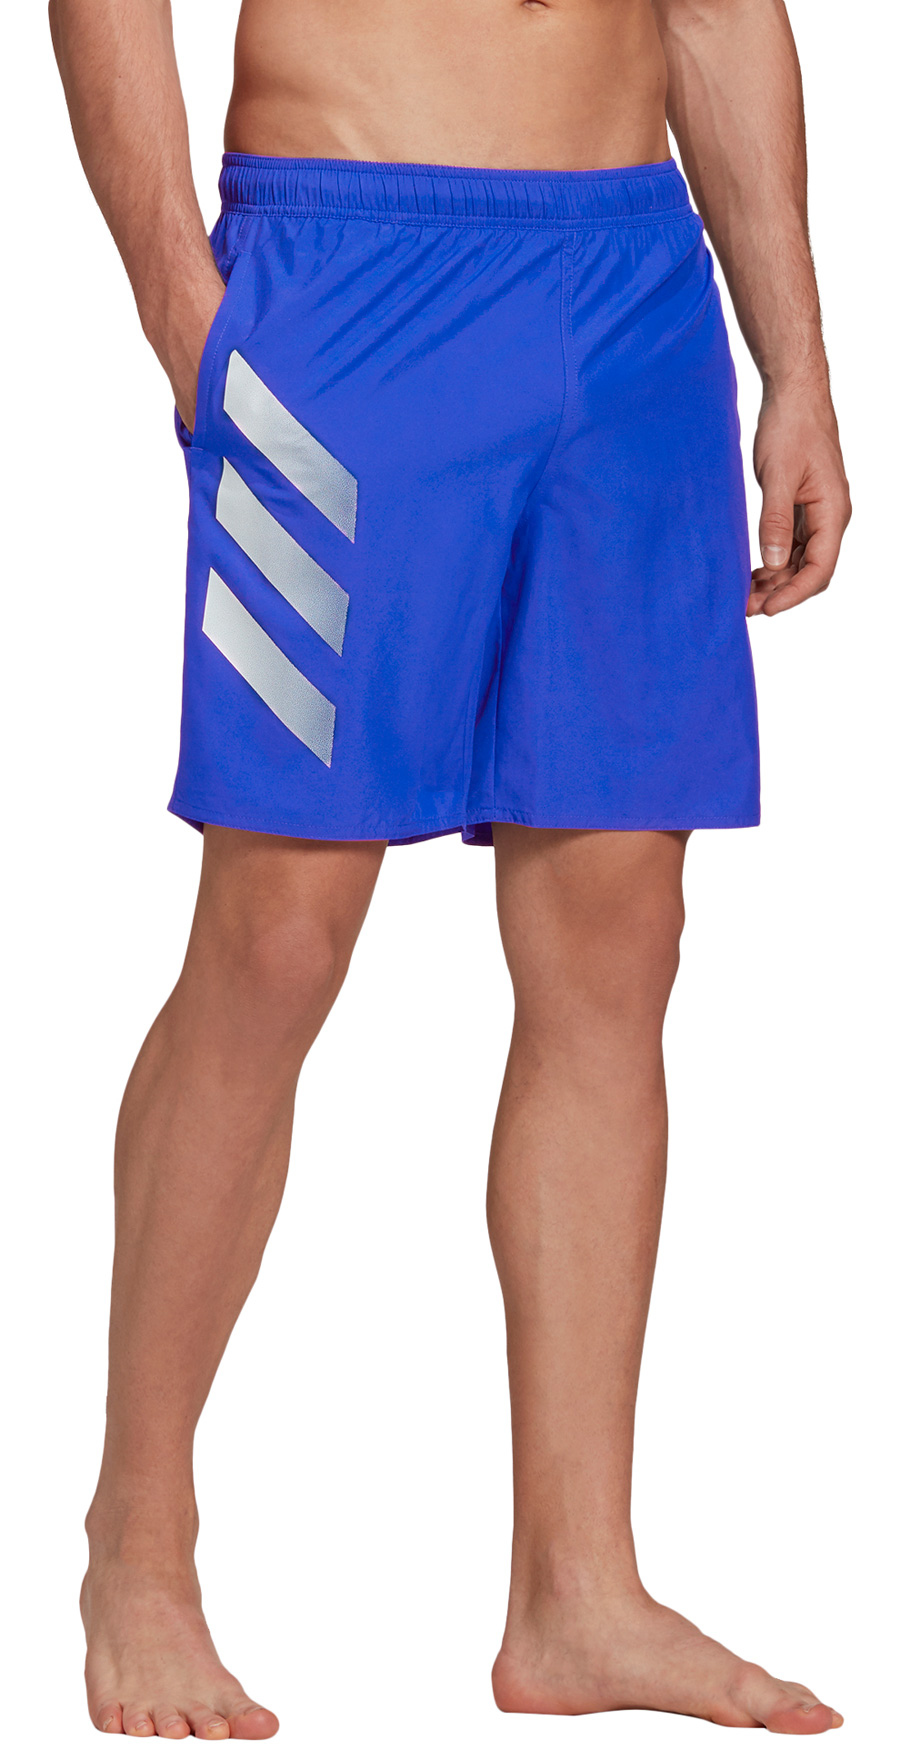 Image of adidas Men's Bold 3-Stripes CLX Swim Shorts - royal blue